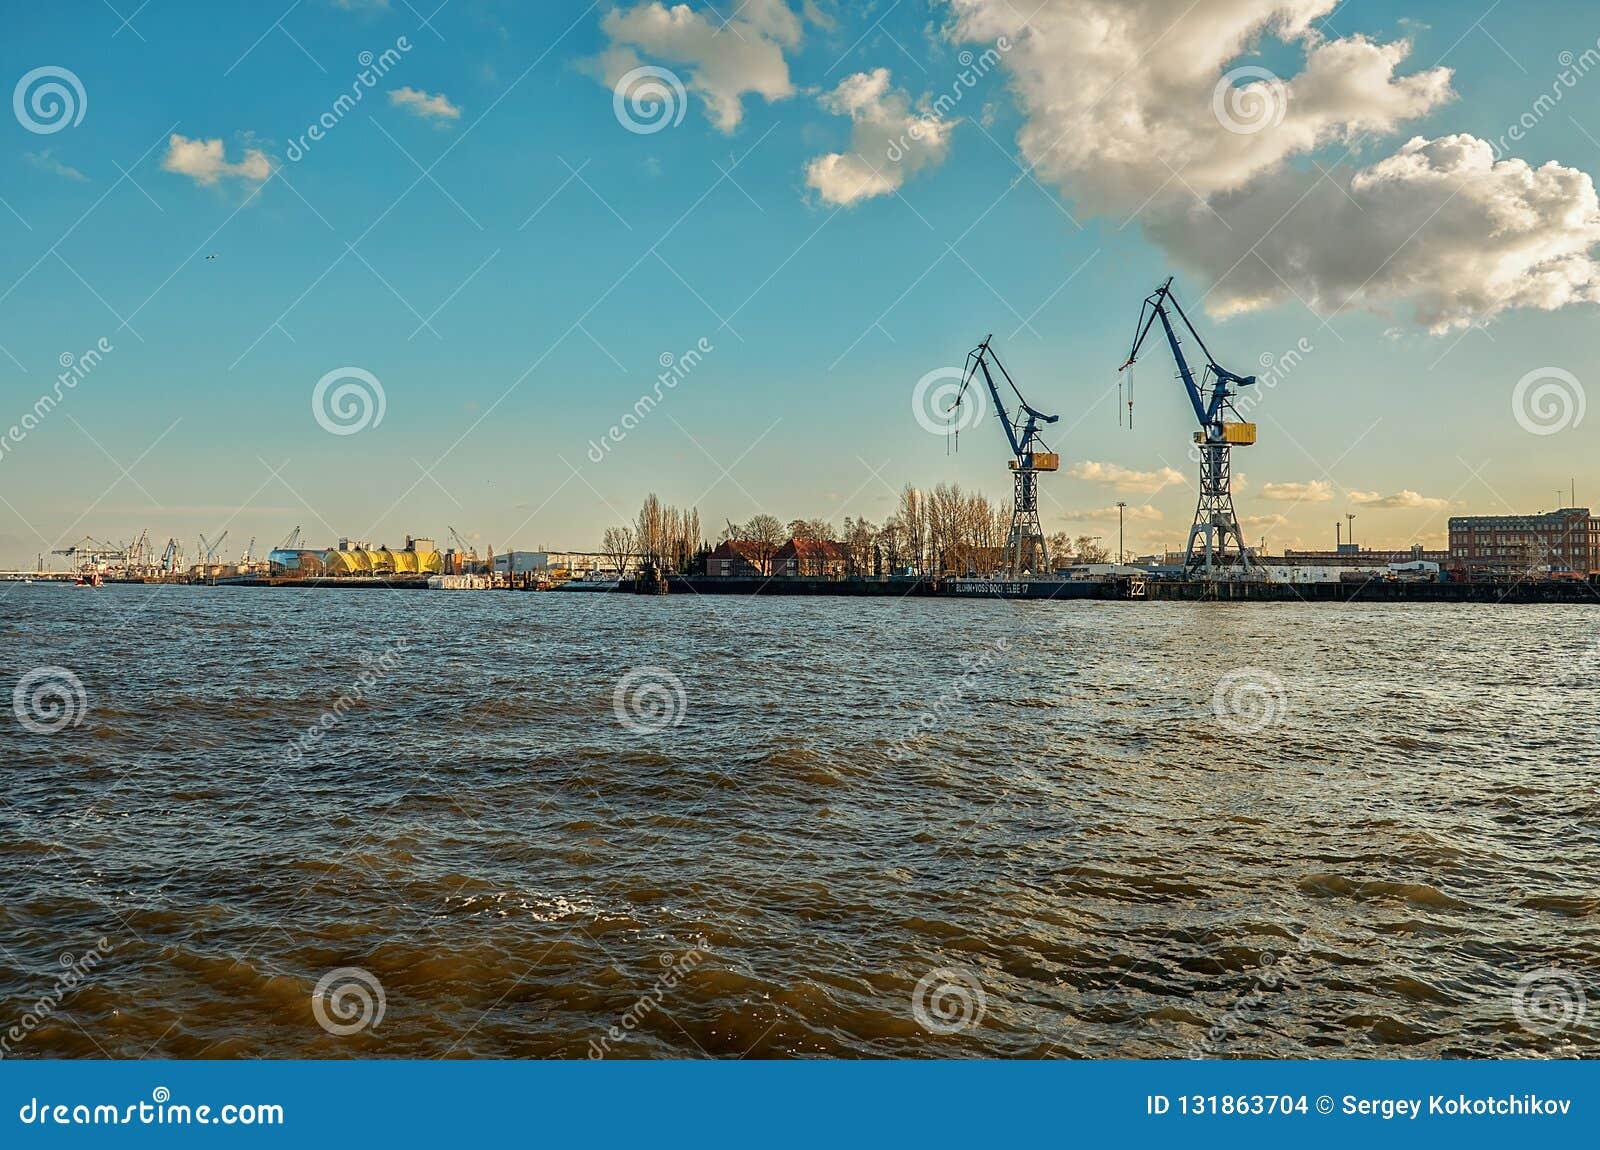 Germany. Port of Hamburg on the river Elbe. February 13, 2018